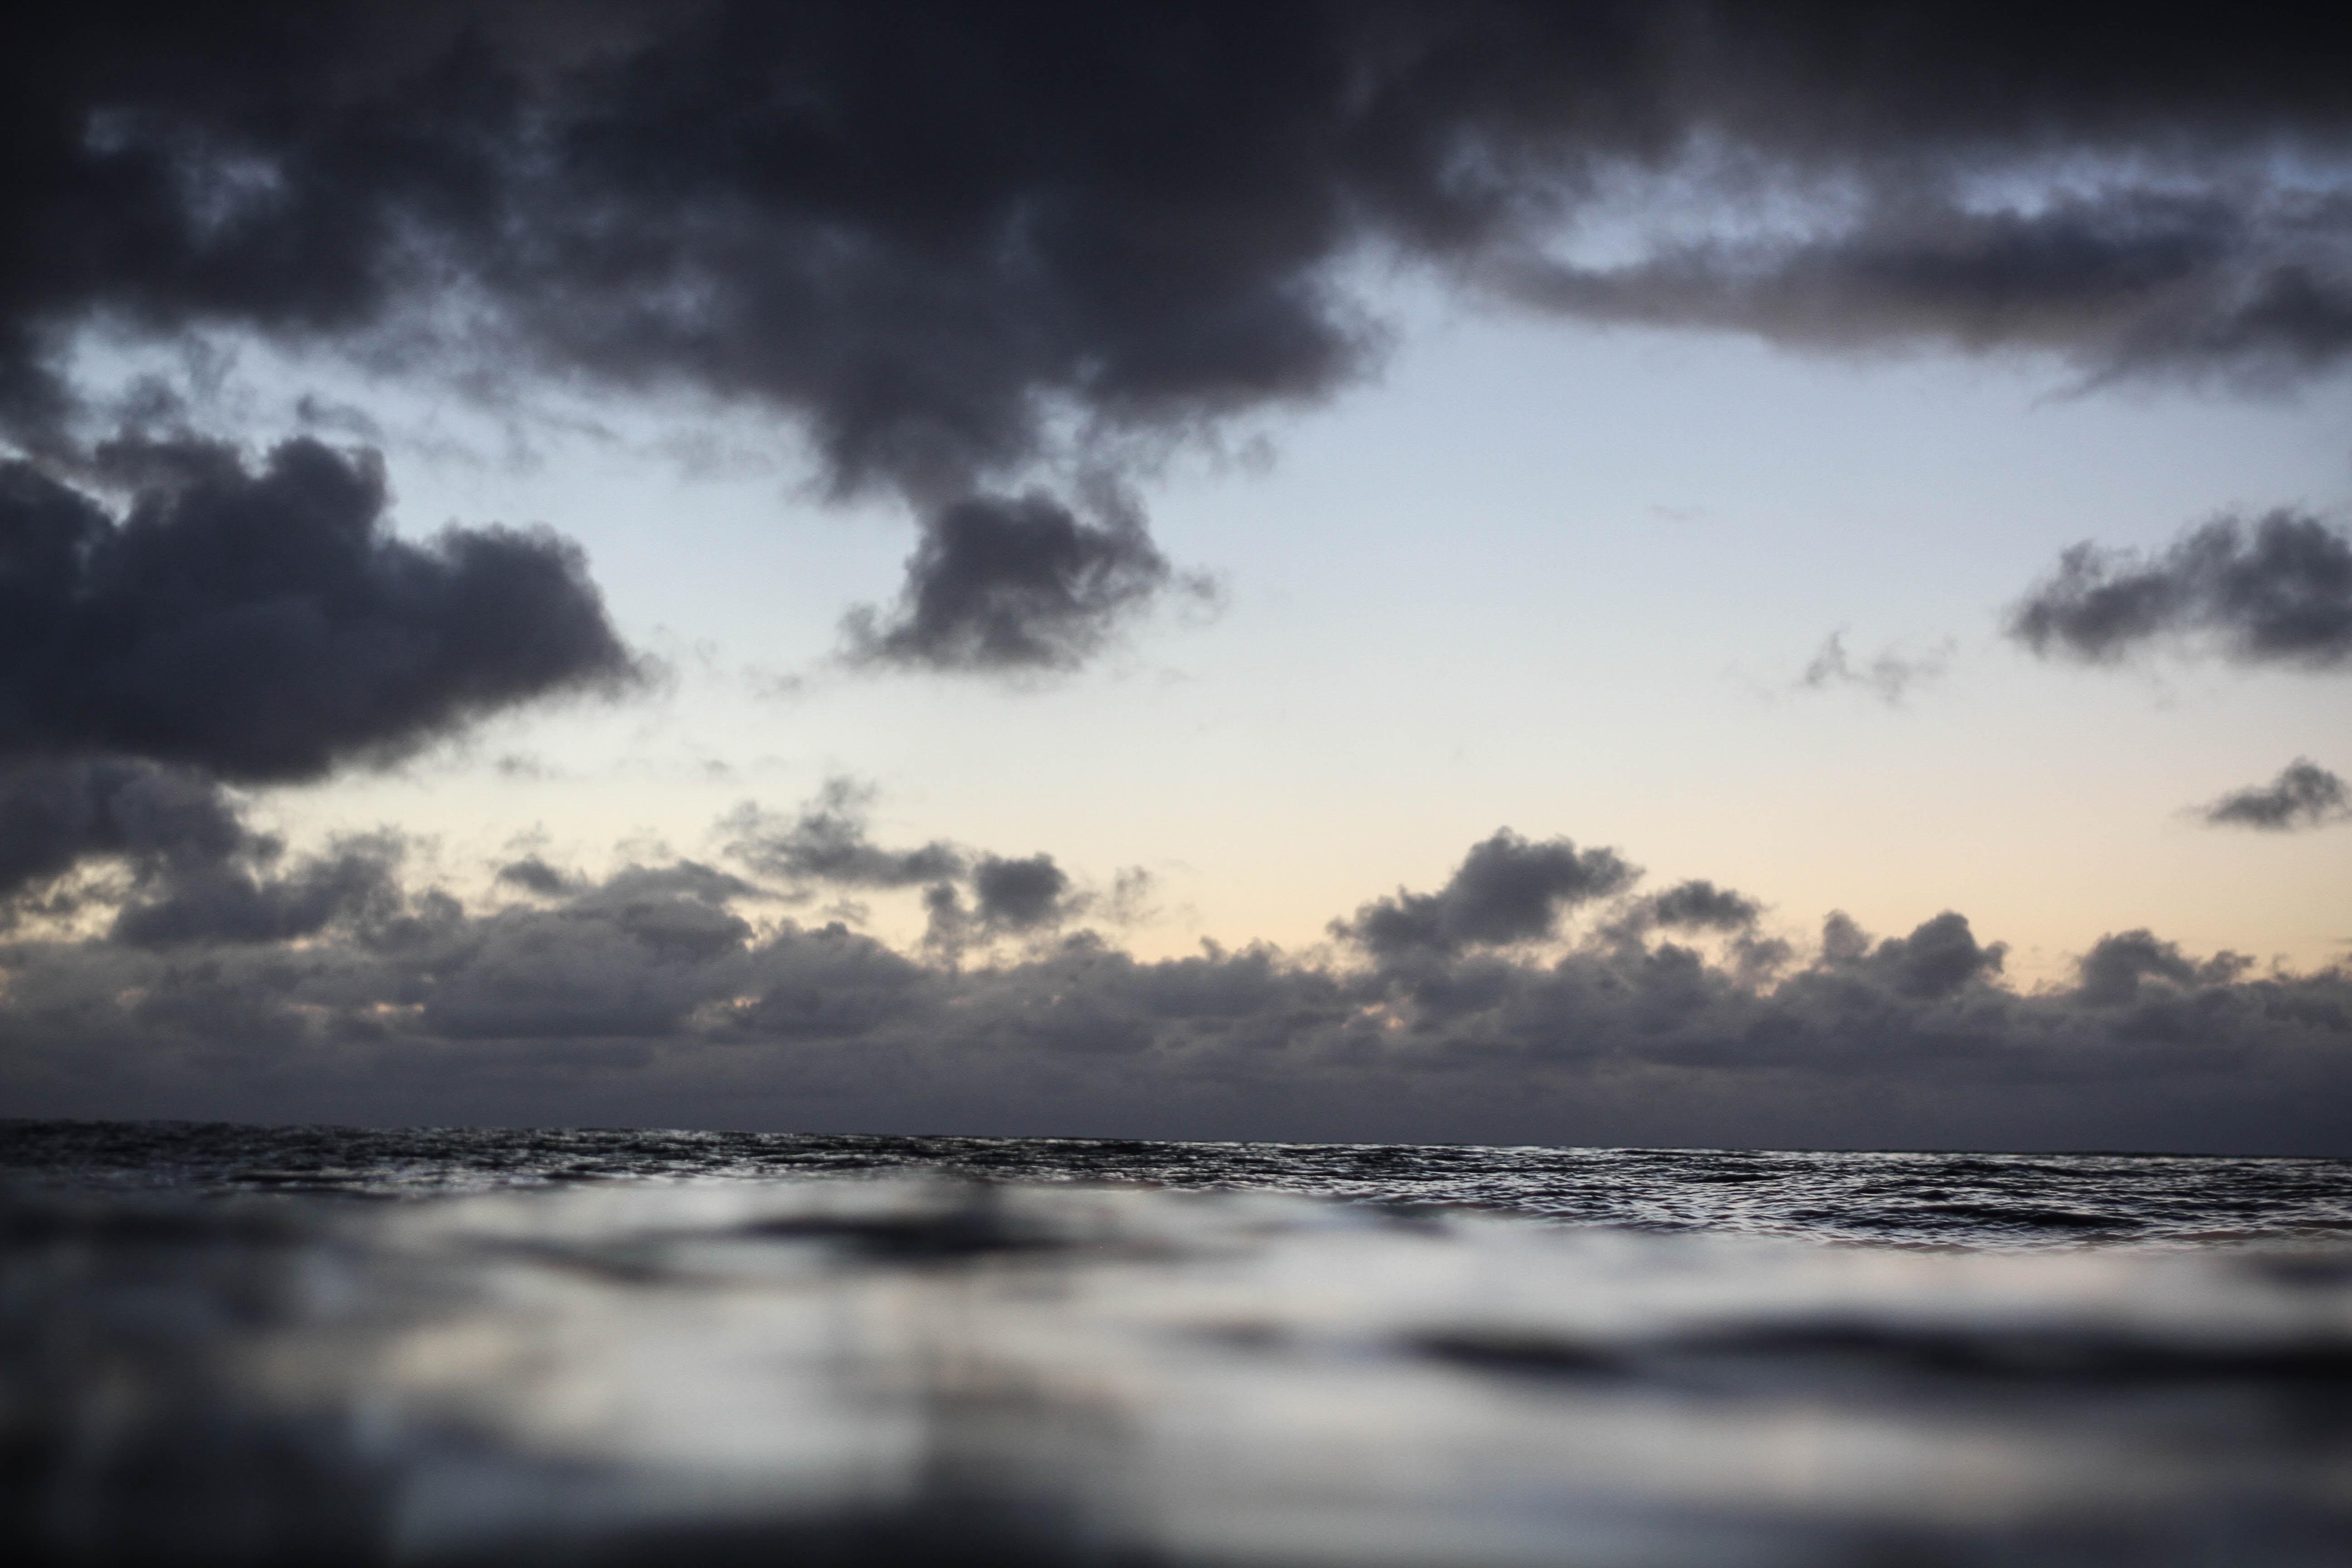 stormy seas during cloudy skies